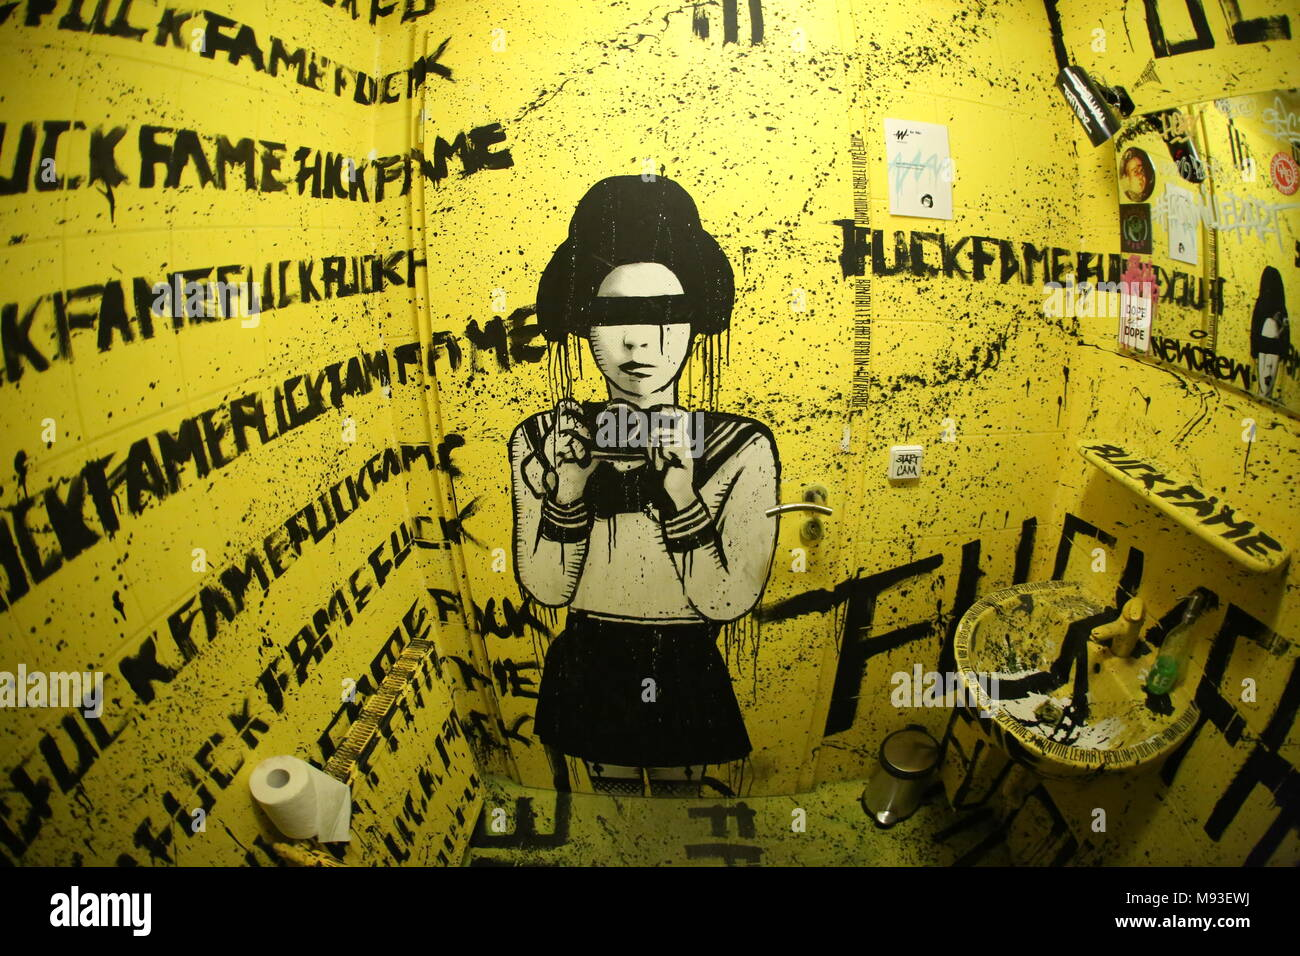 Berlin Wall Art Project Stock Photos & Berlin Wall Art Project Stock ...